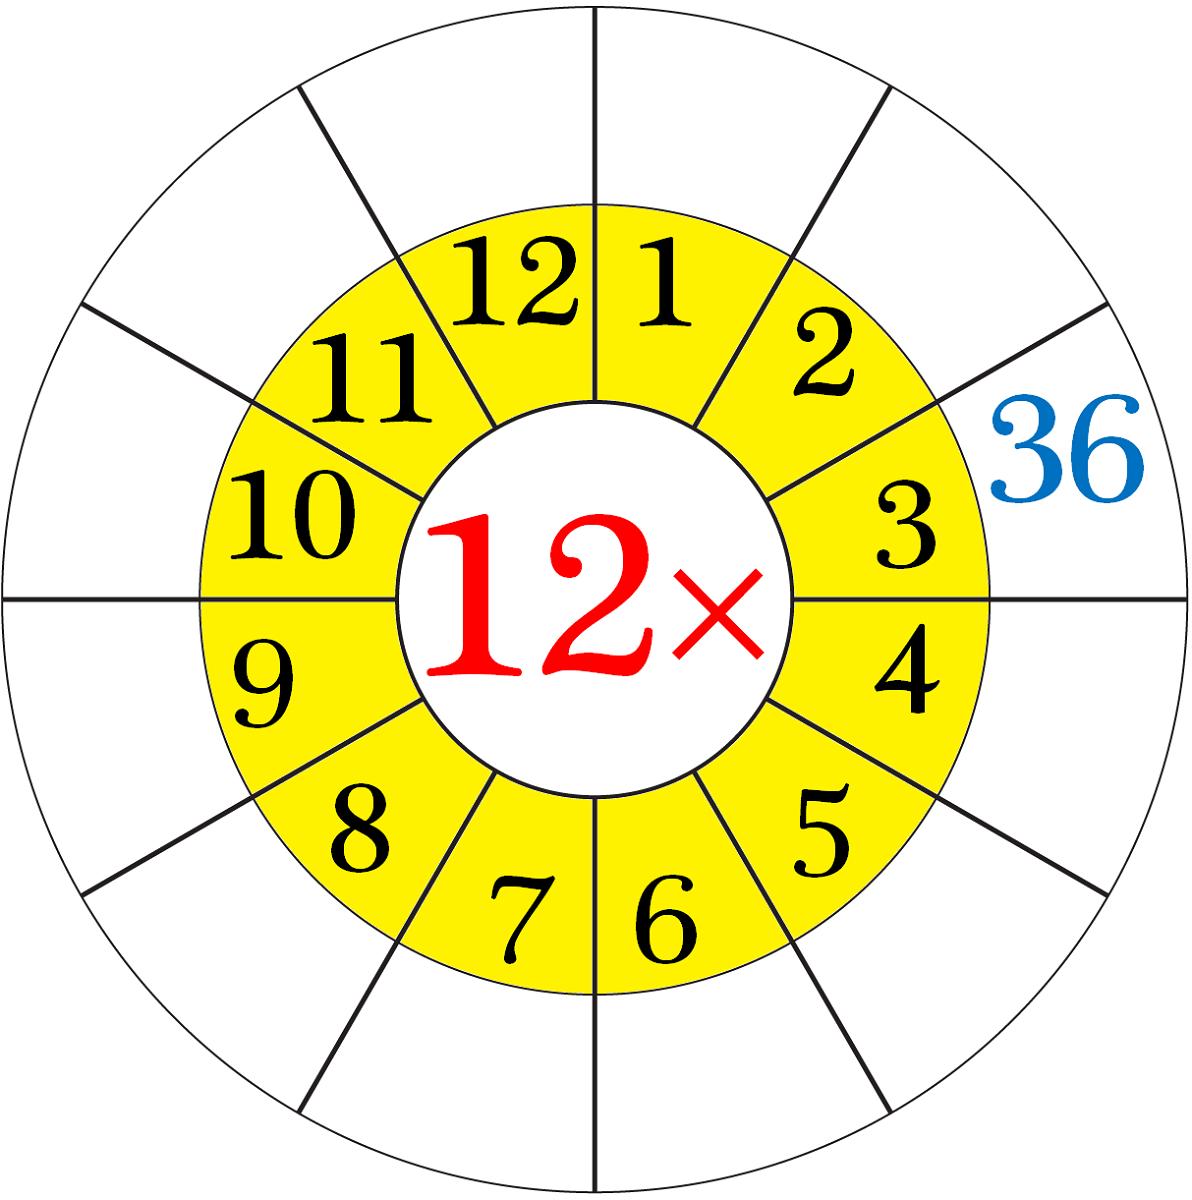 12 times table worksheet interesting